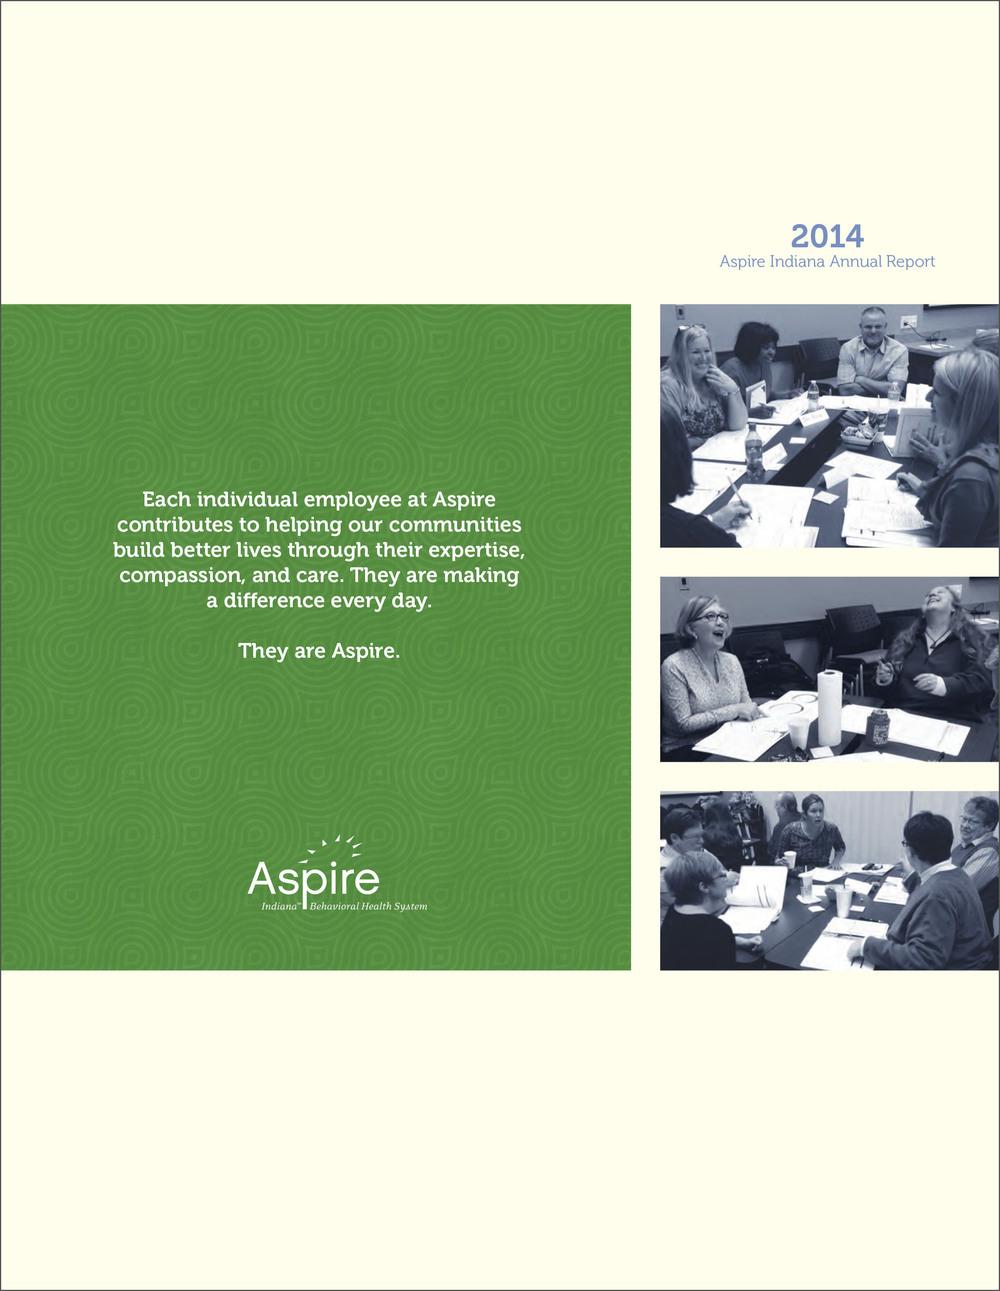 Aspire_Annual_Report_2014.jpg